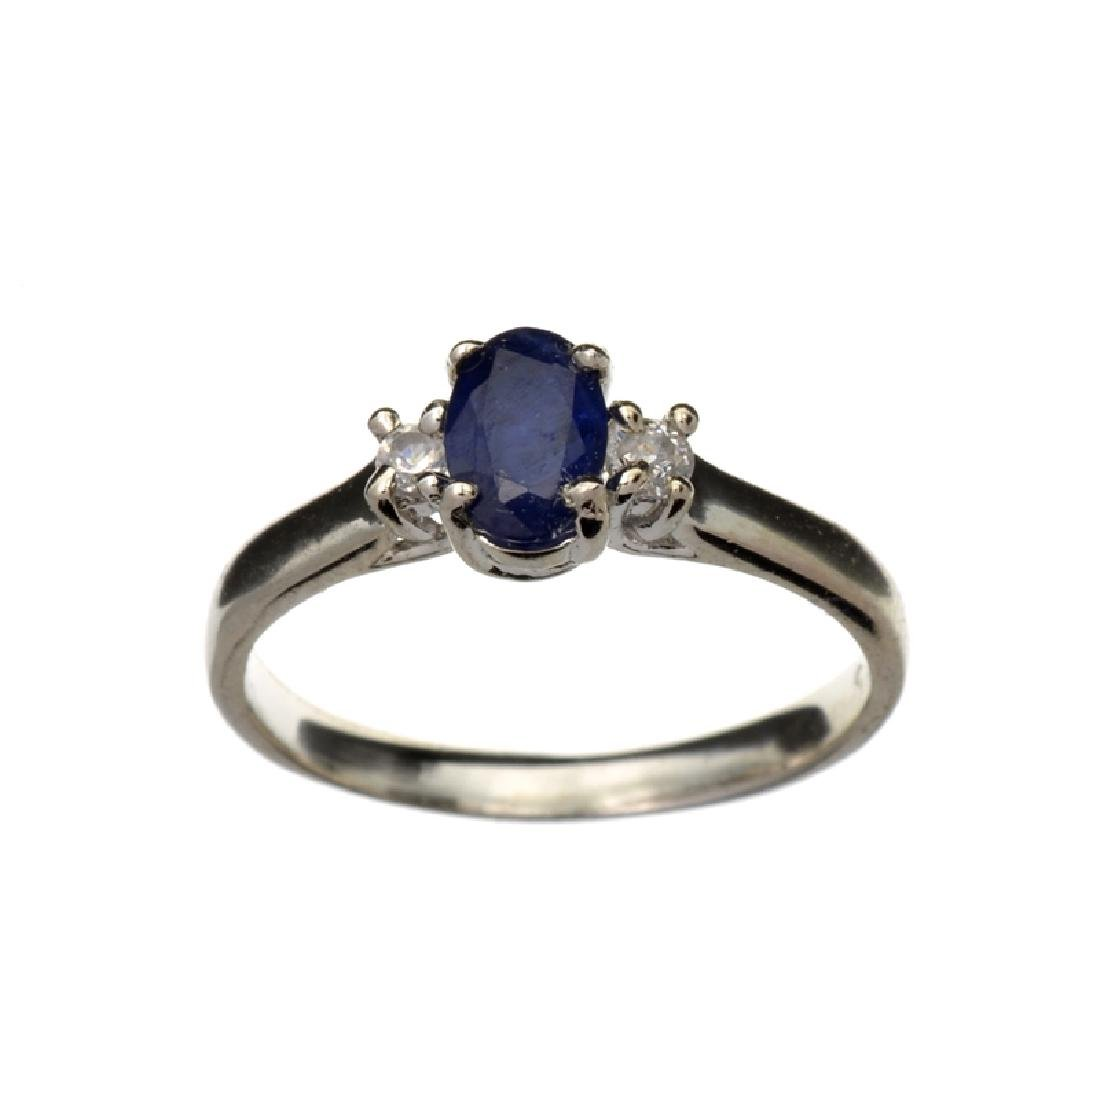 APP: 0.8k Fine Jewelry 0.45CT Blue Sapphire And Topaz